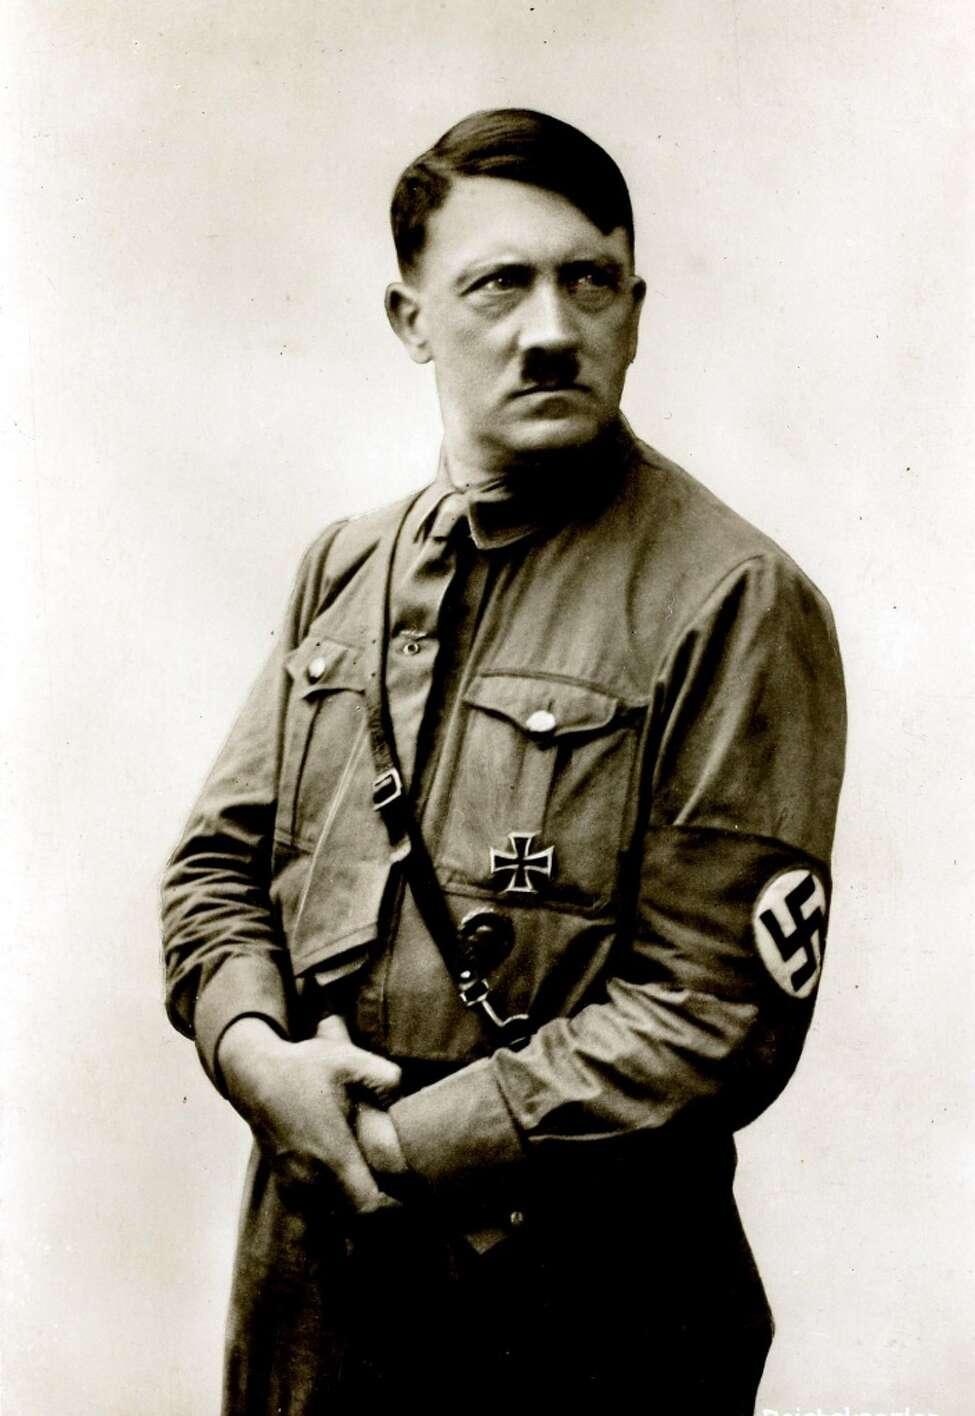 On April 20, 1889: Adolf Hitler, German leader and Nazi dictator, was born.